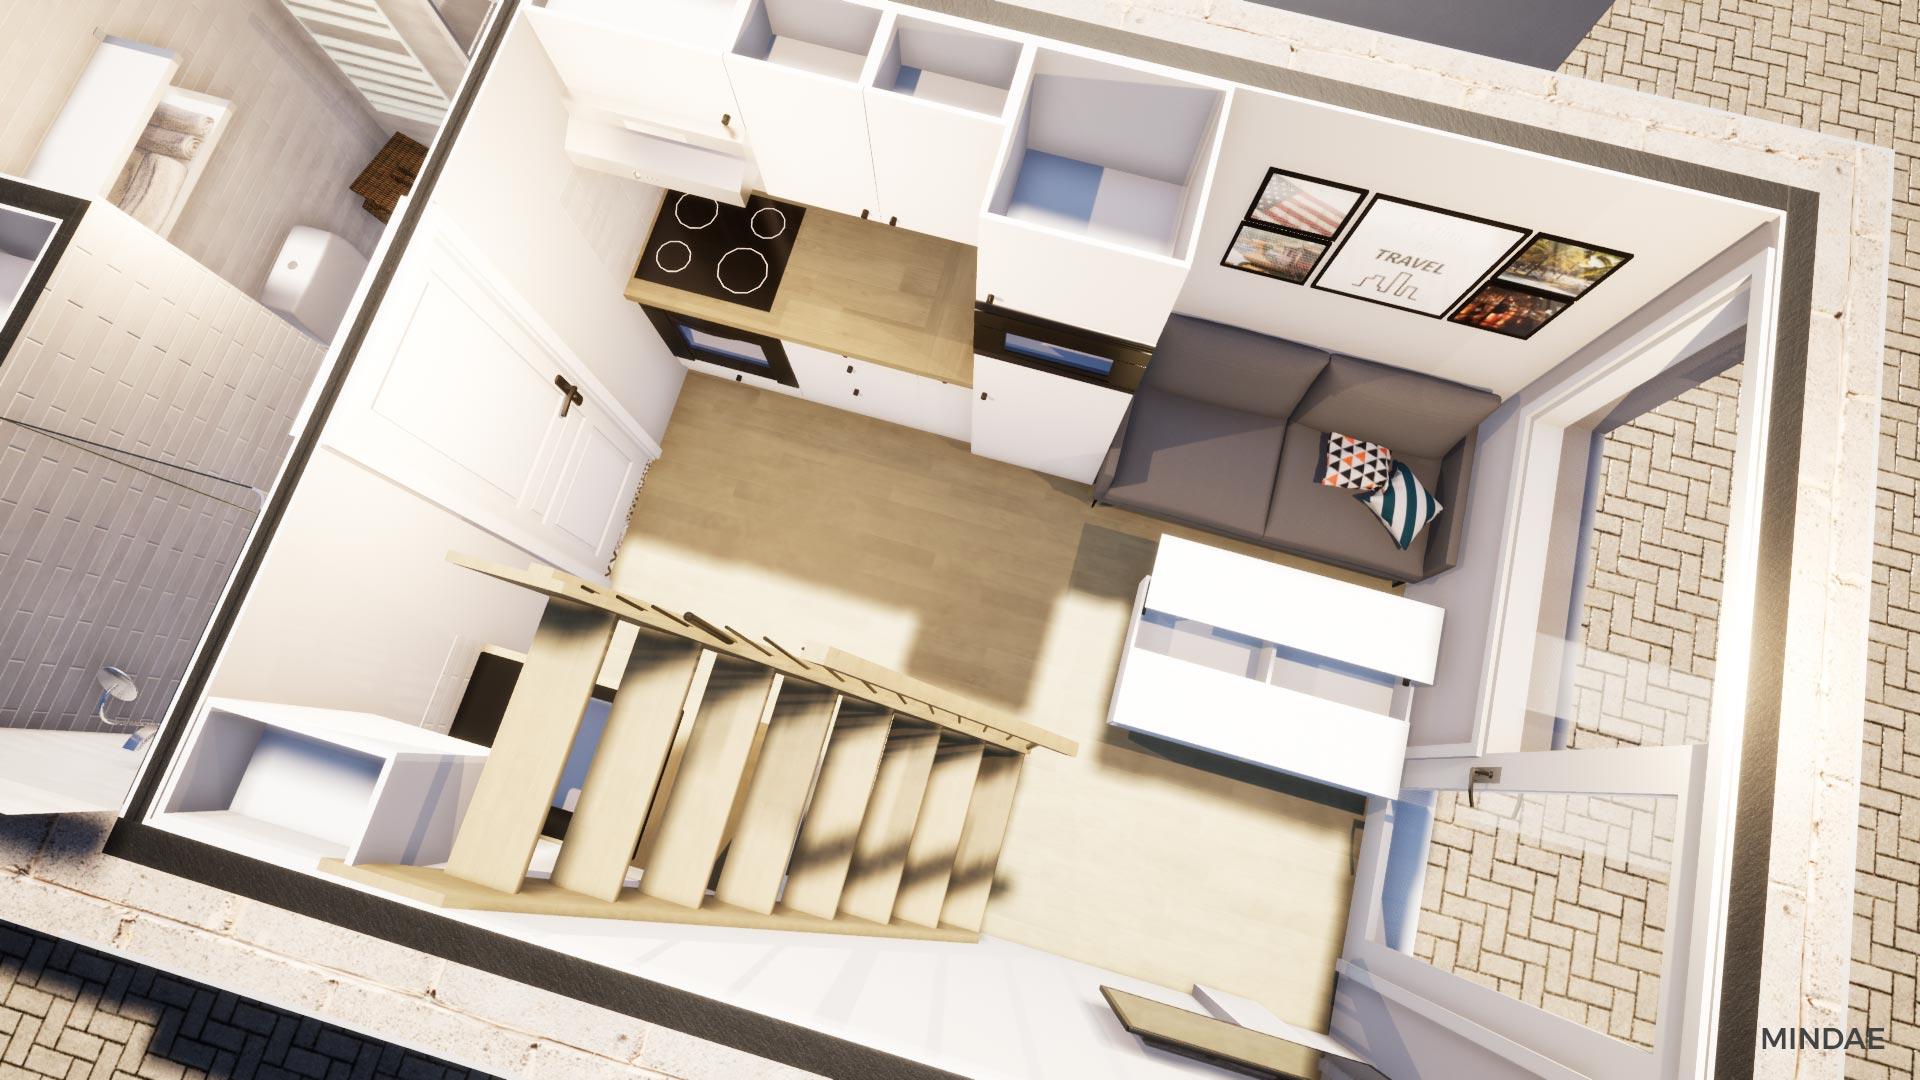 Mindae_3D_as_immobilier_projet_A_garage_duplex_studio_investisseur_caen-(8)